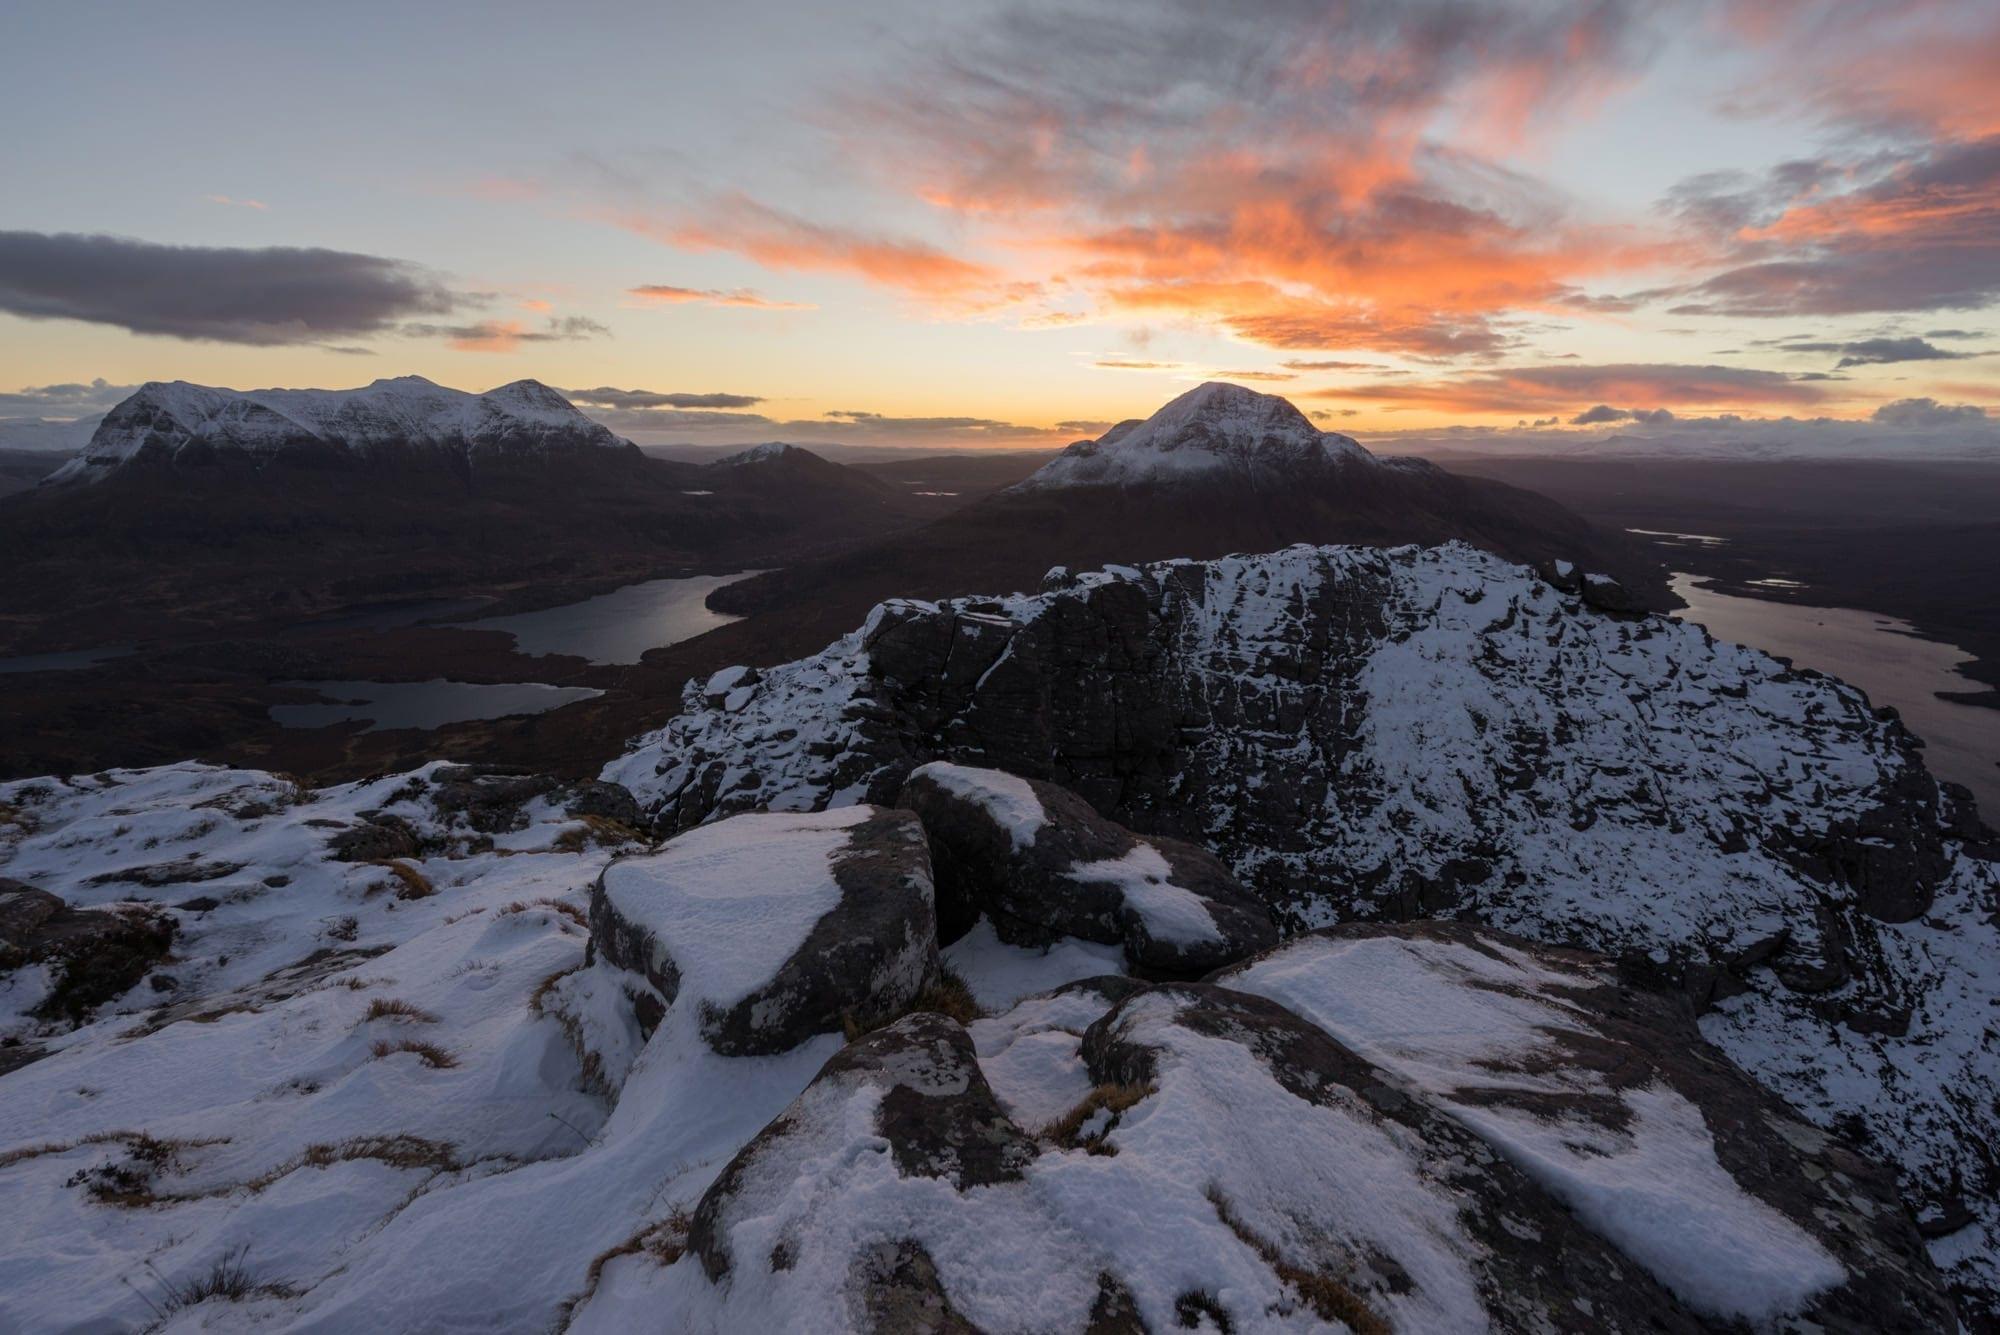 Stac Polliadh Sunrise - Scotland Wild Camping Photography Workshop